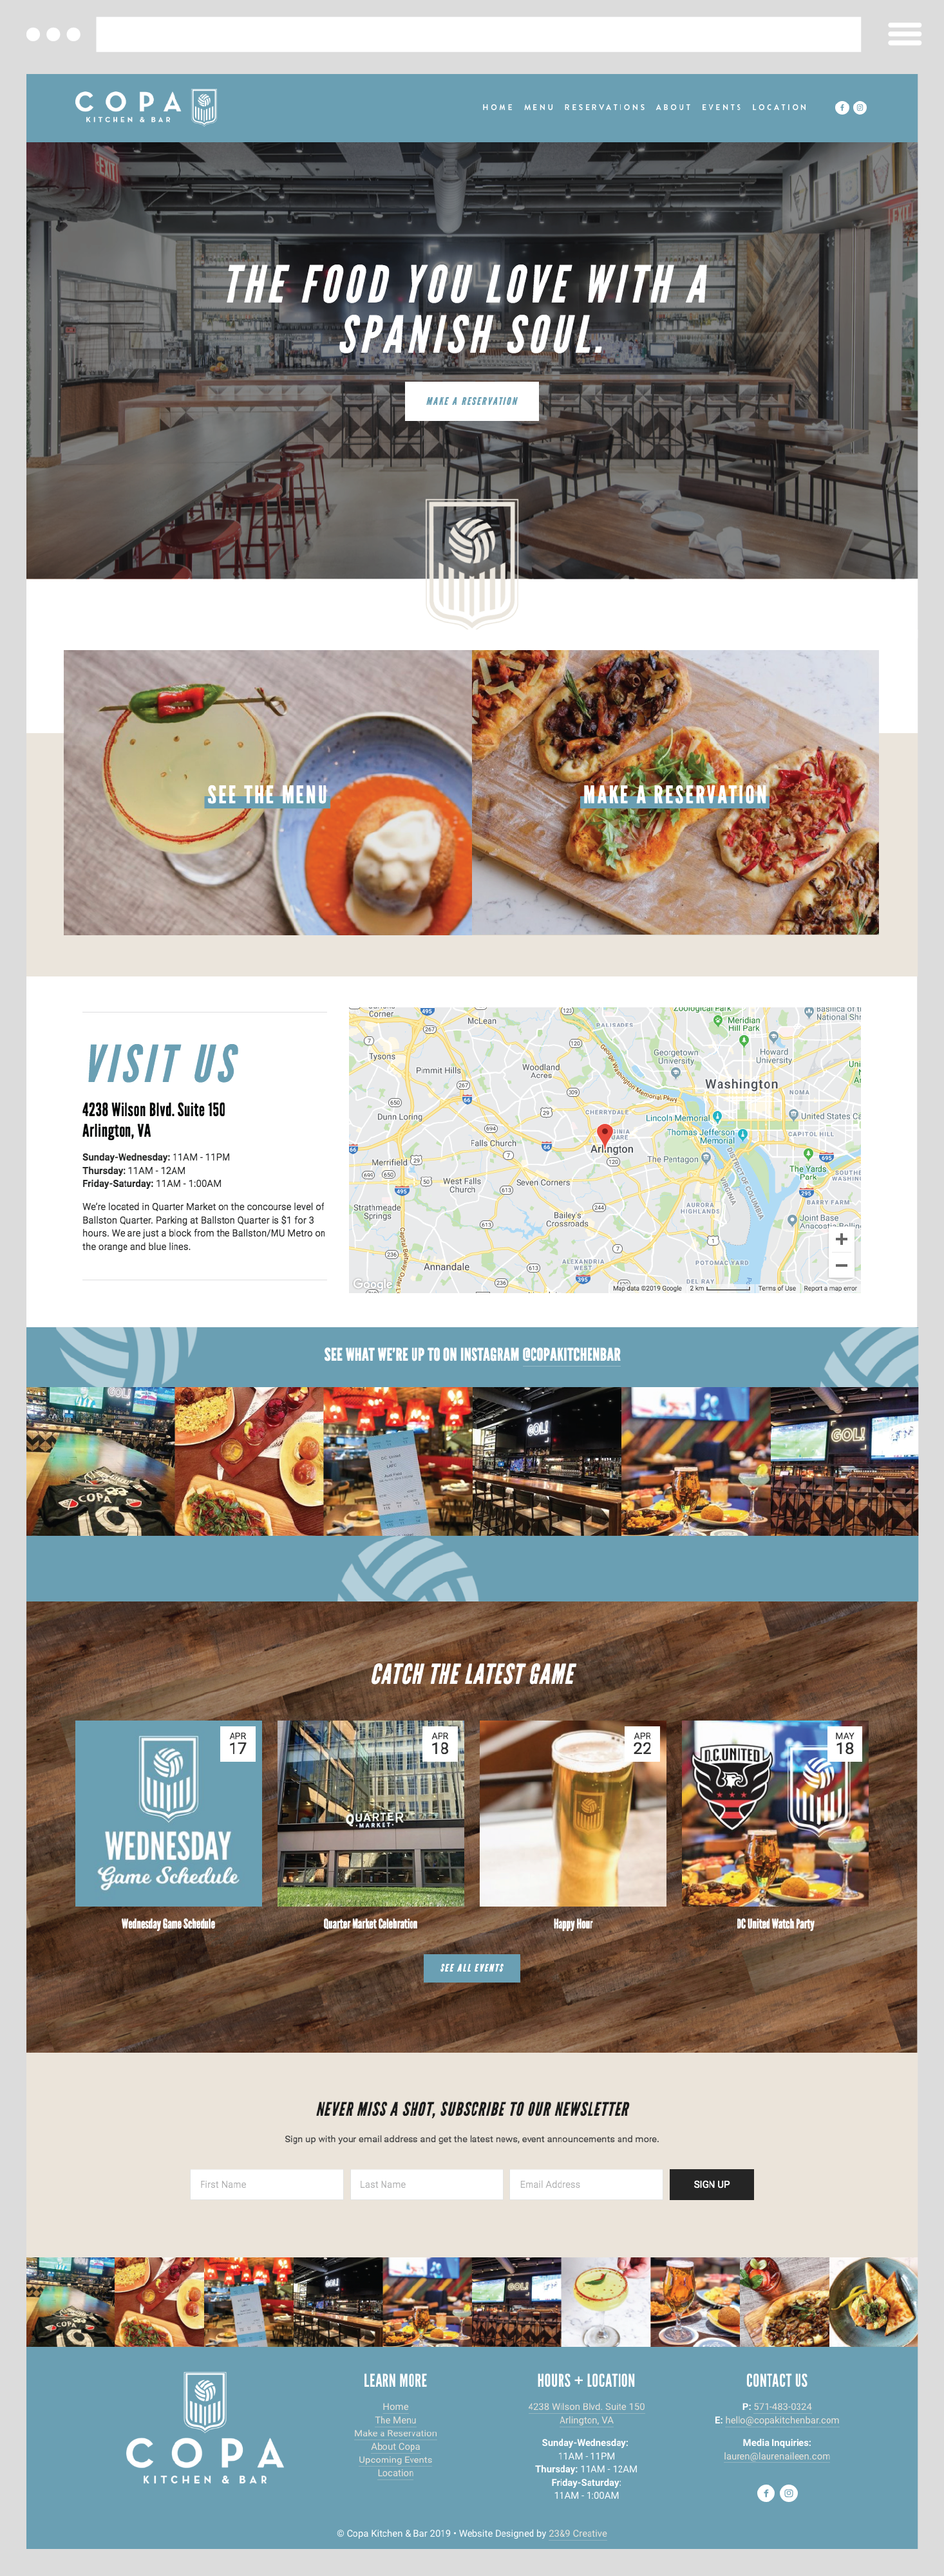 Custom Website Design By 23 9 Creative For Copa Kitchen Bar In Arlington Va In 2020 Custom Website Custom Website Design Portfolio Website